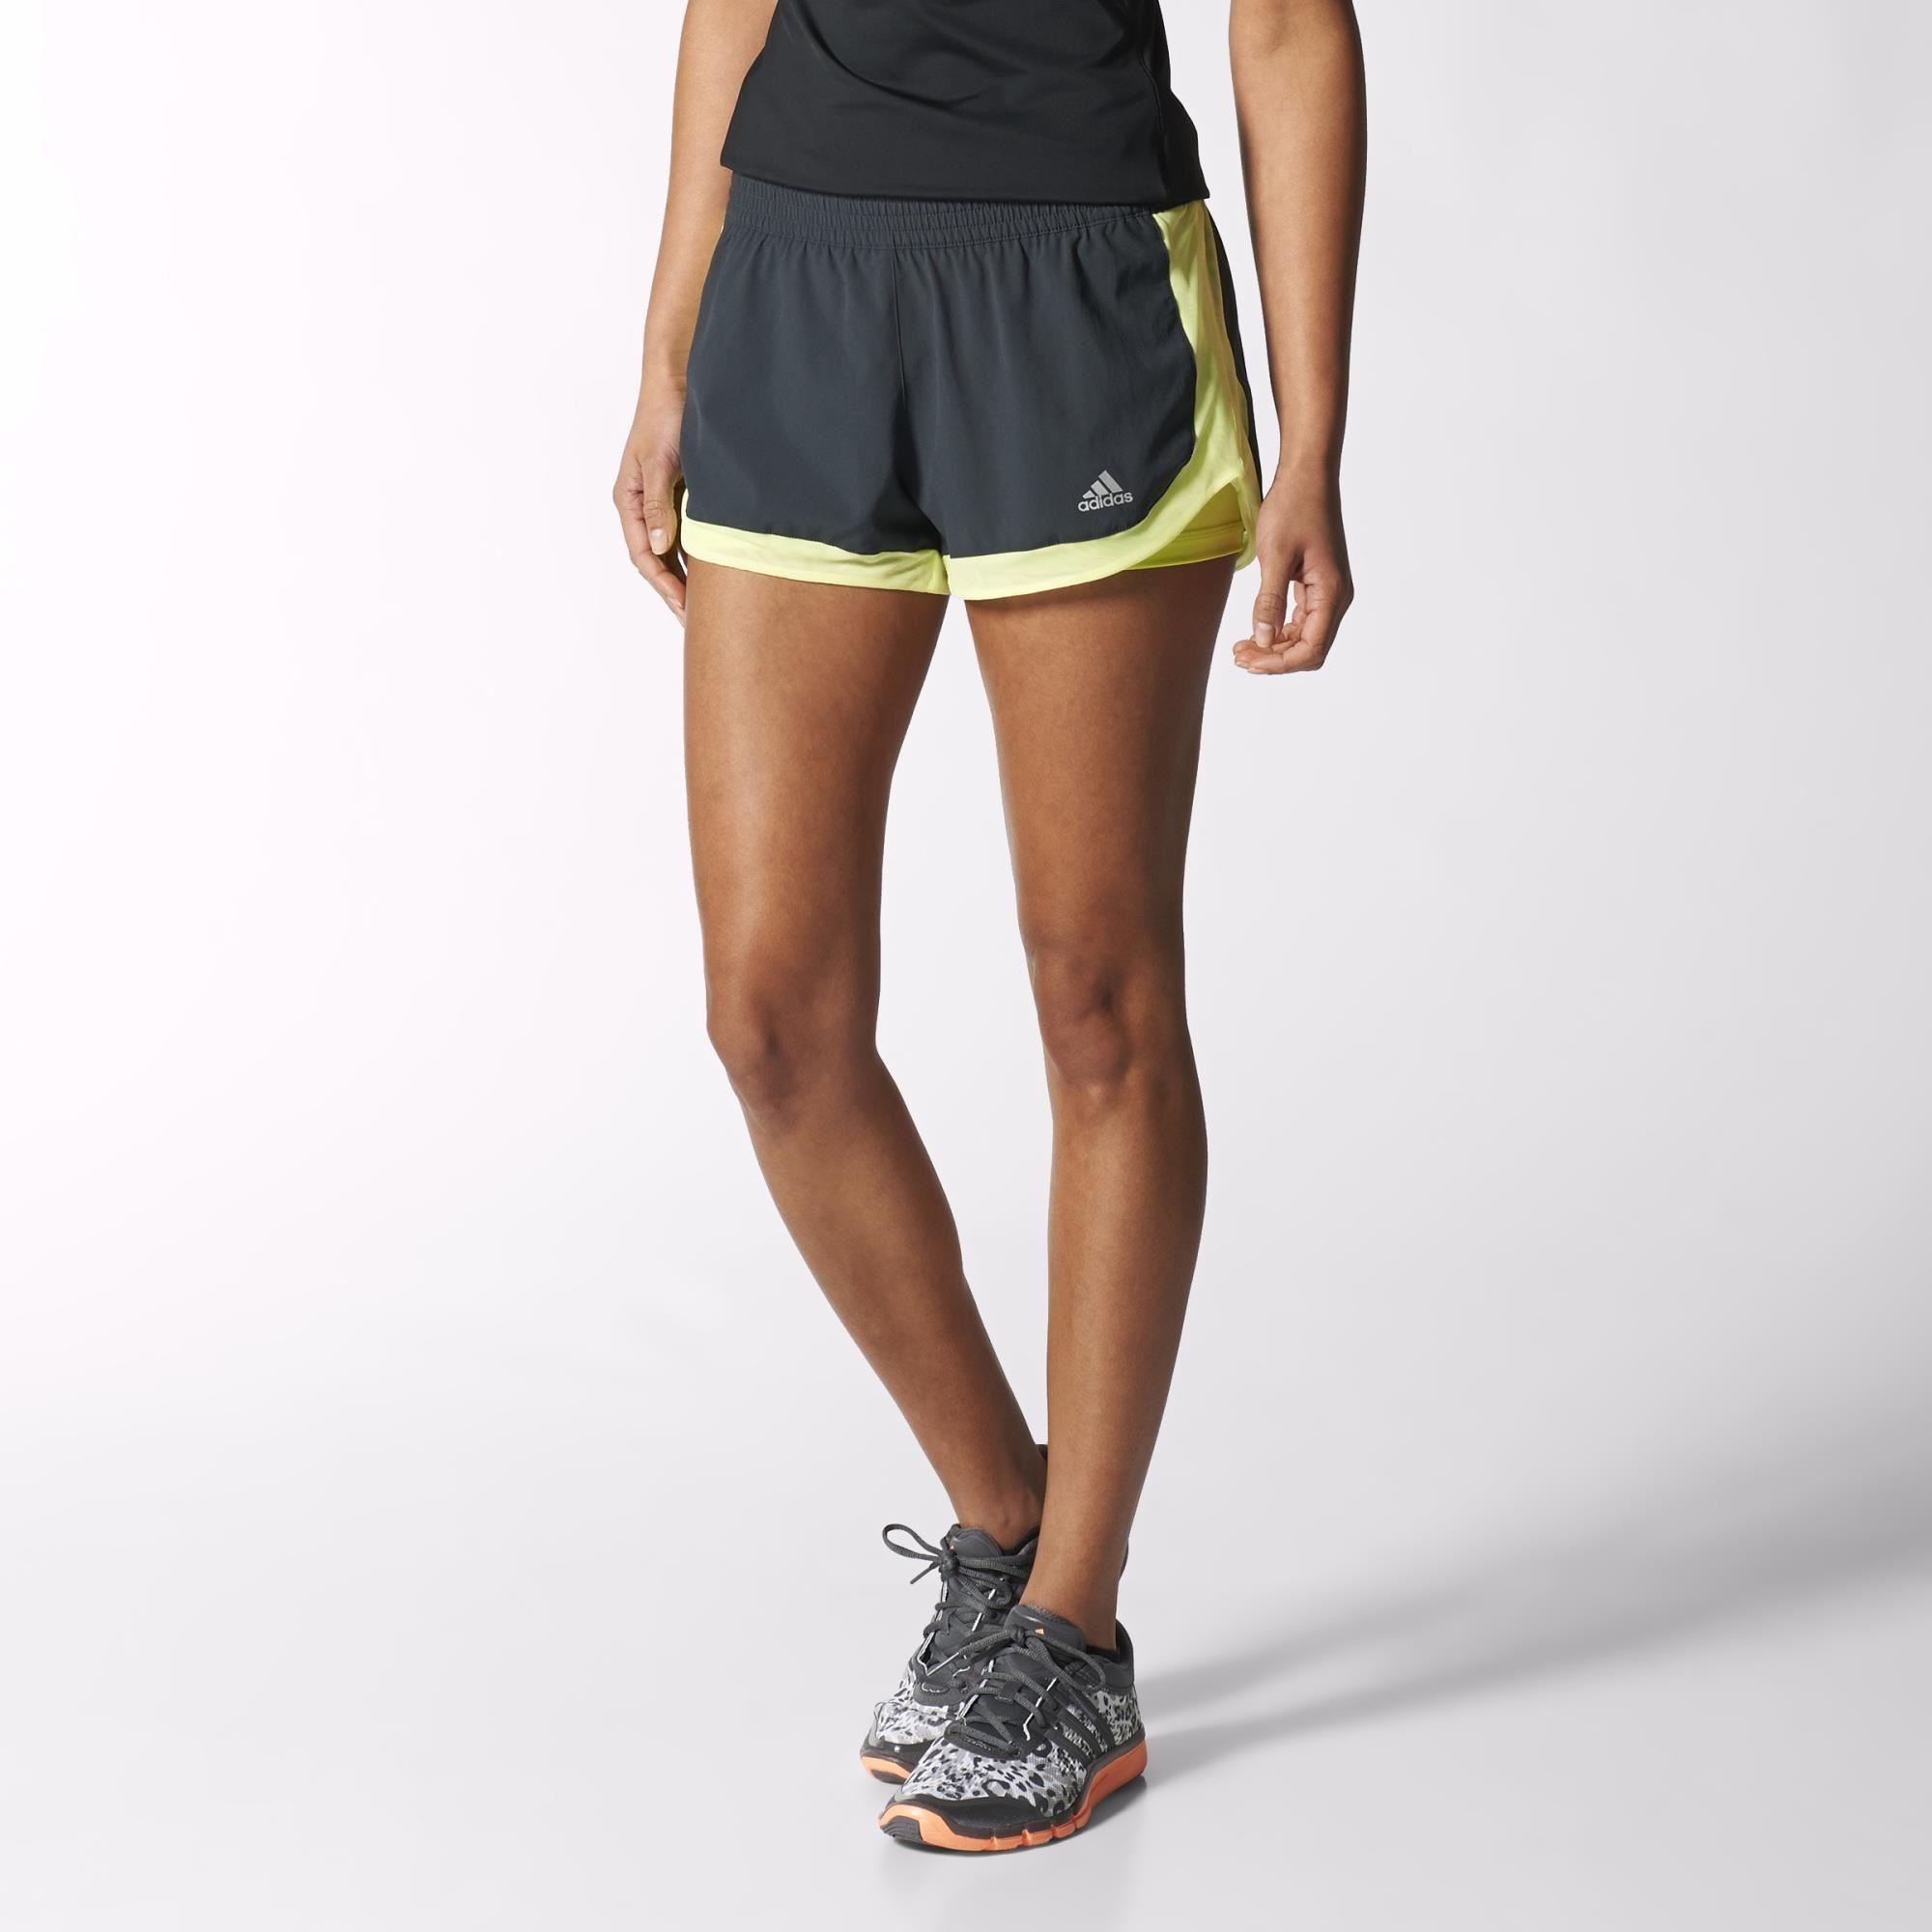 adidas 2IN1 Workout Shorts Workout shorts, Training